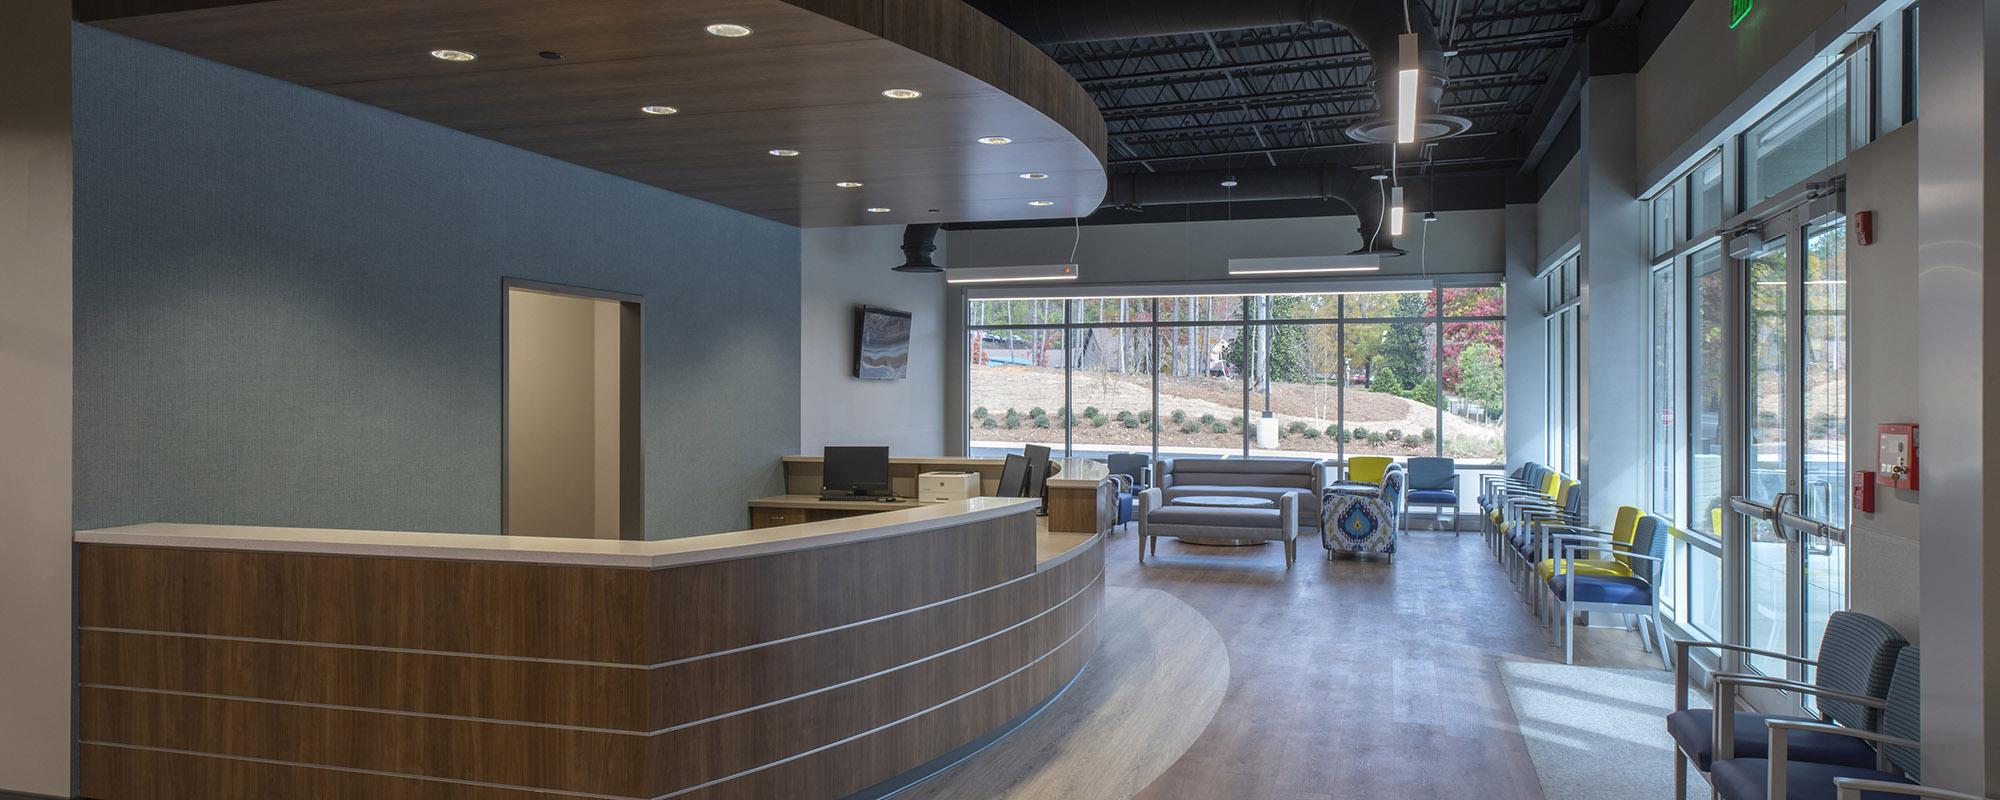 dentist office reception area